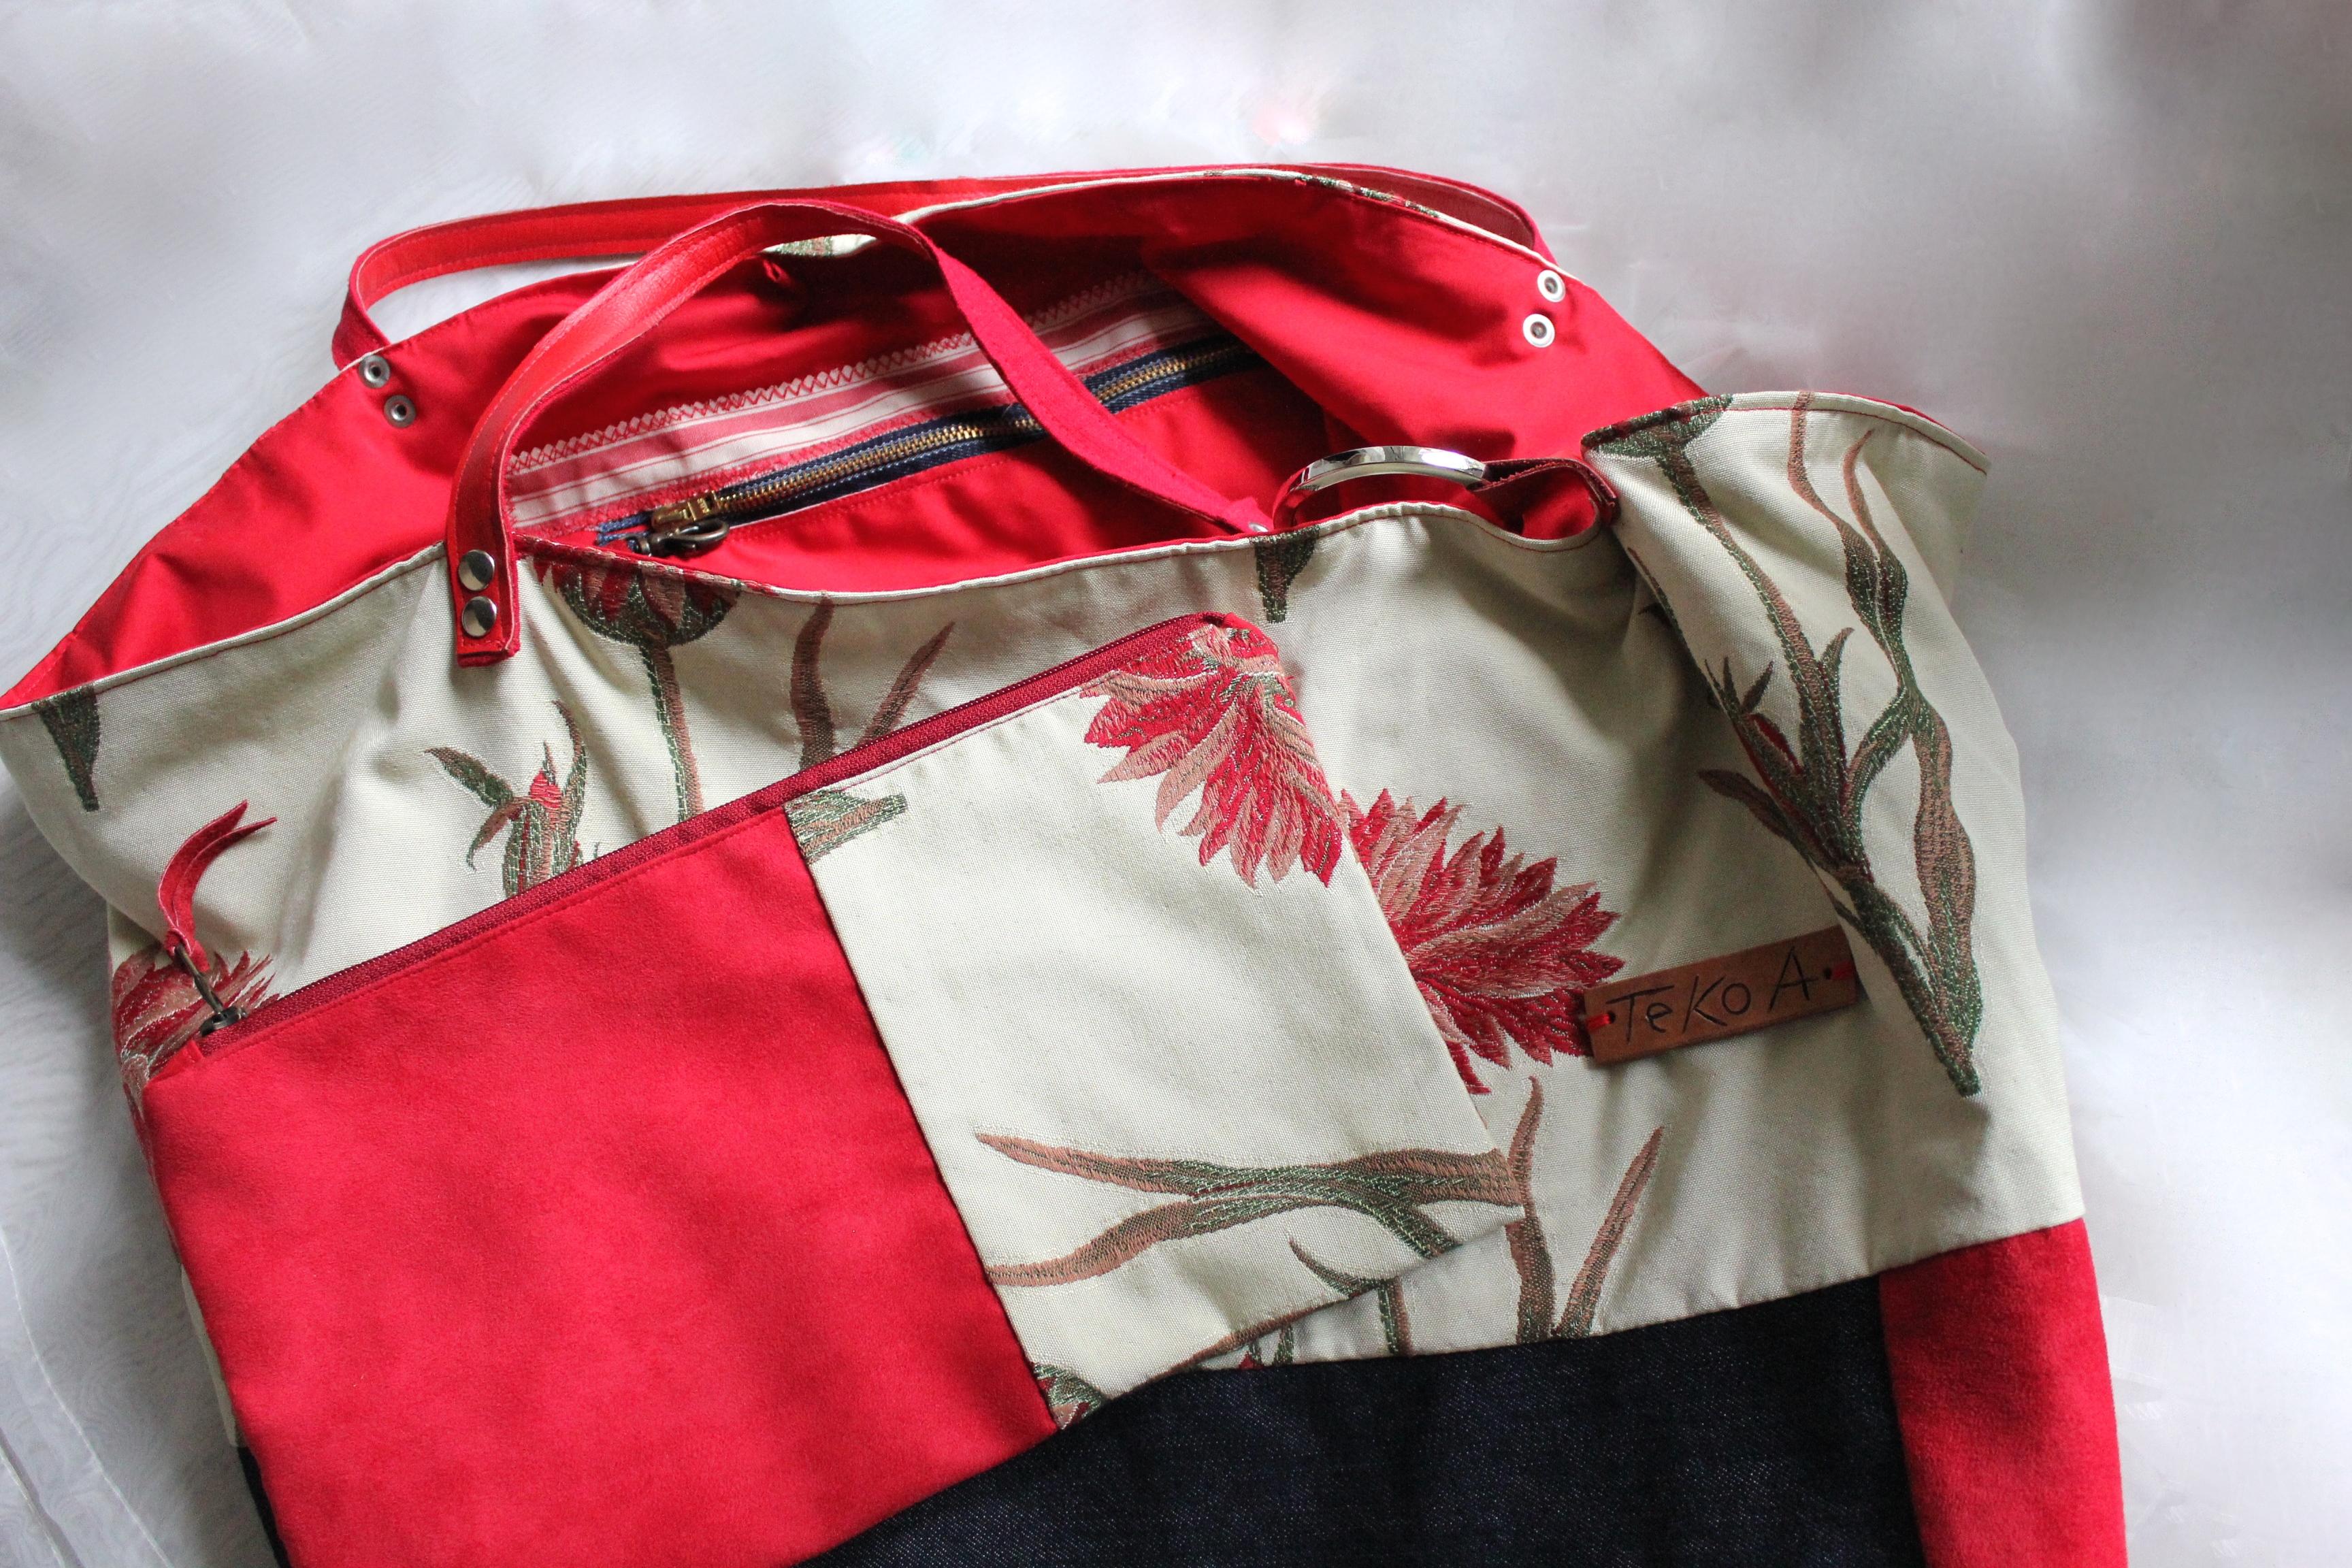 Borse Artigianali Tessuto : Cardi in jeens borsa di tessuto fatta a mano tekoa milano